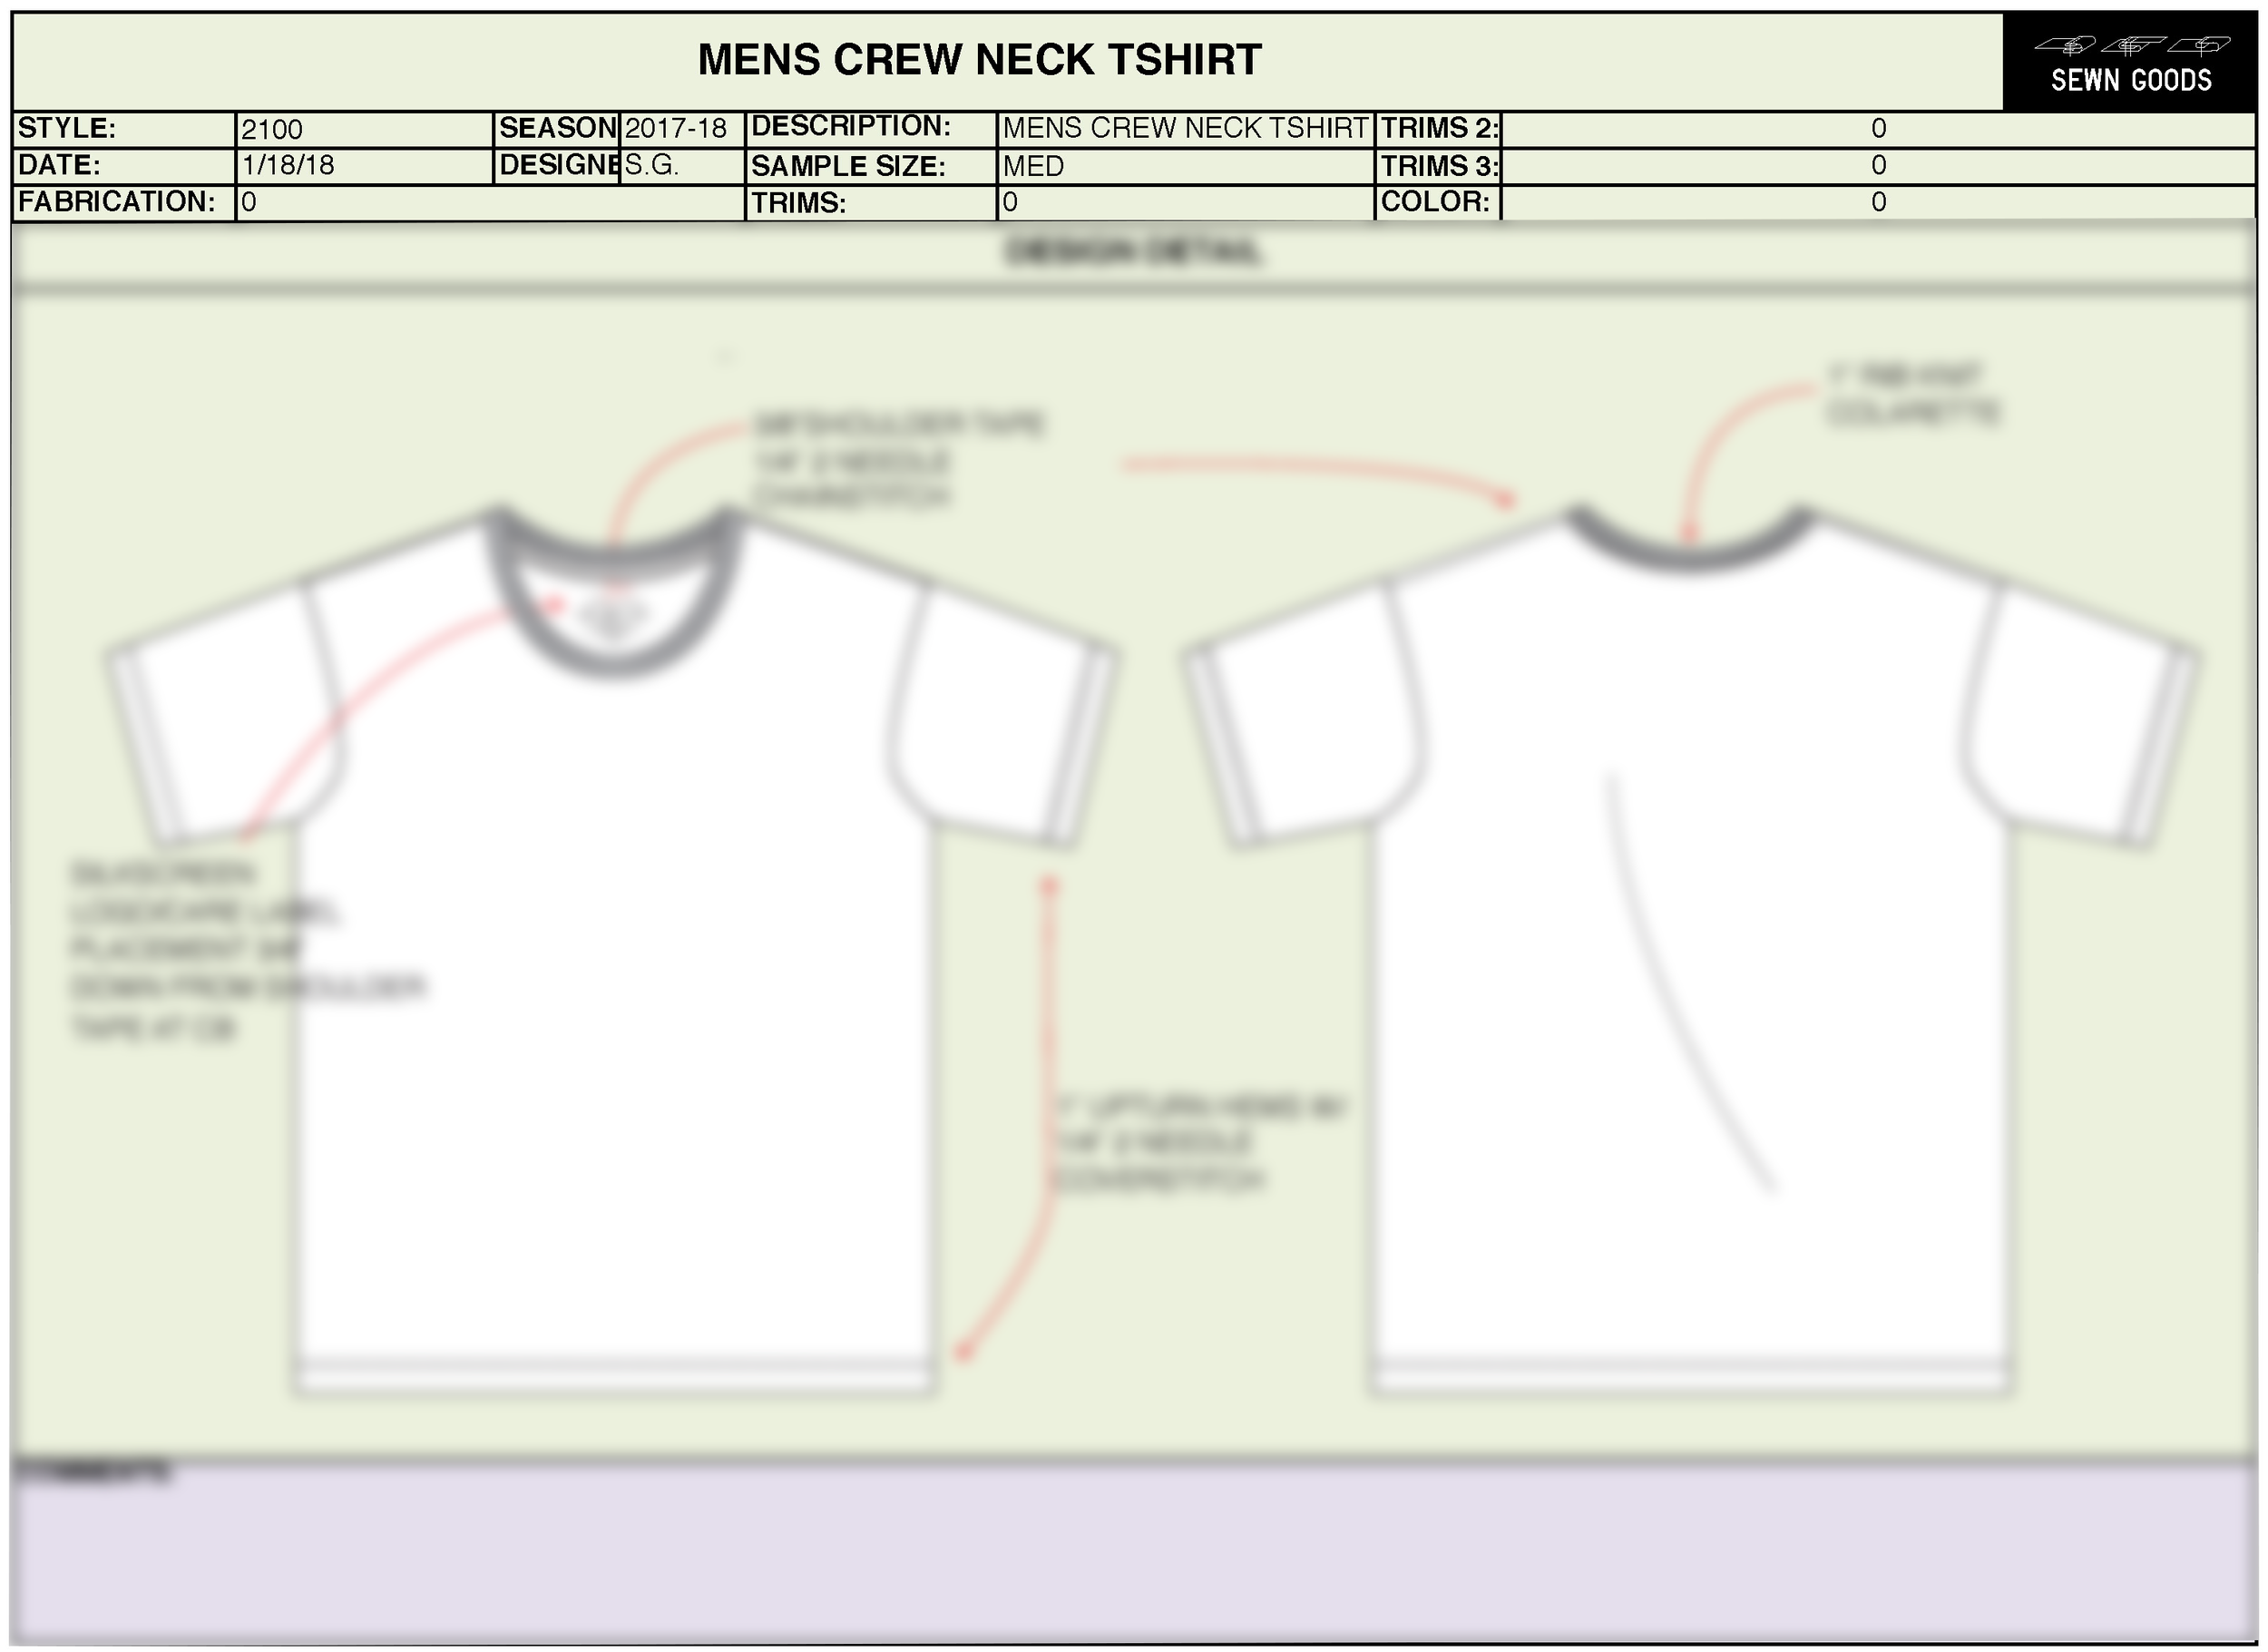 2100 Crew T Shirt Tech Pack Template Xs 4xl Sewn Goods Pattern Makers Sample Makers Apparel Design And Development